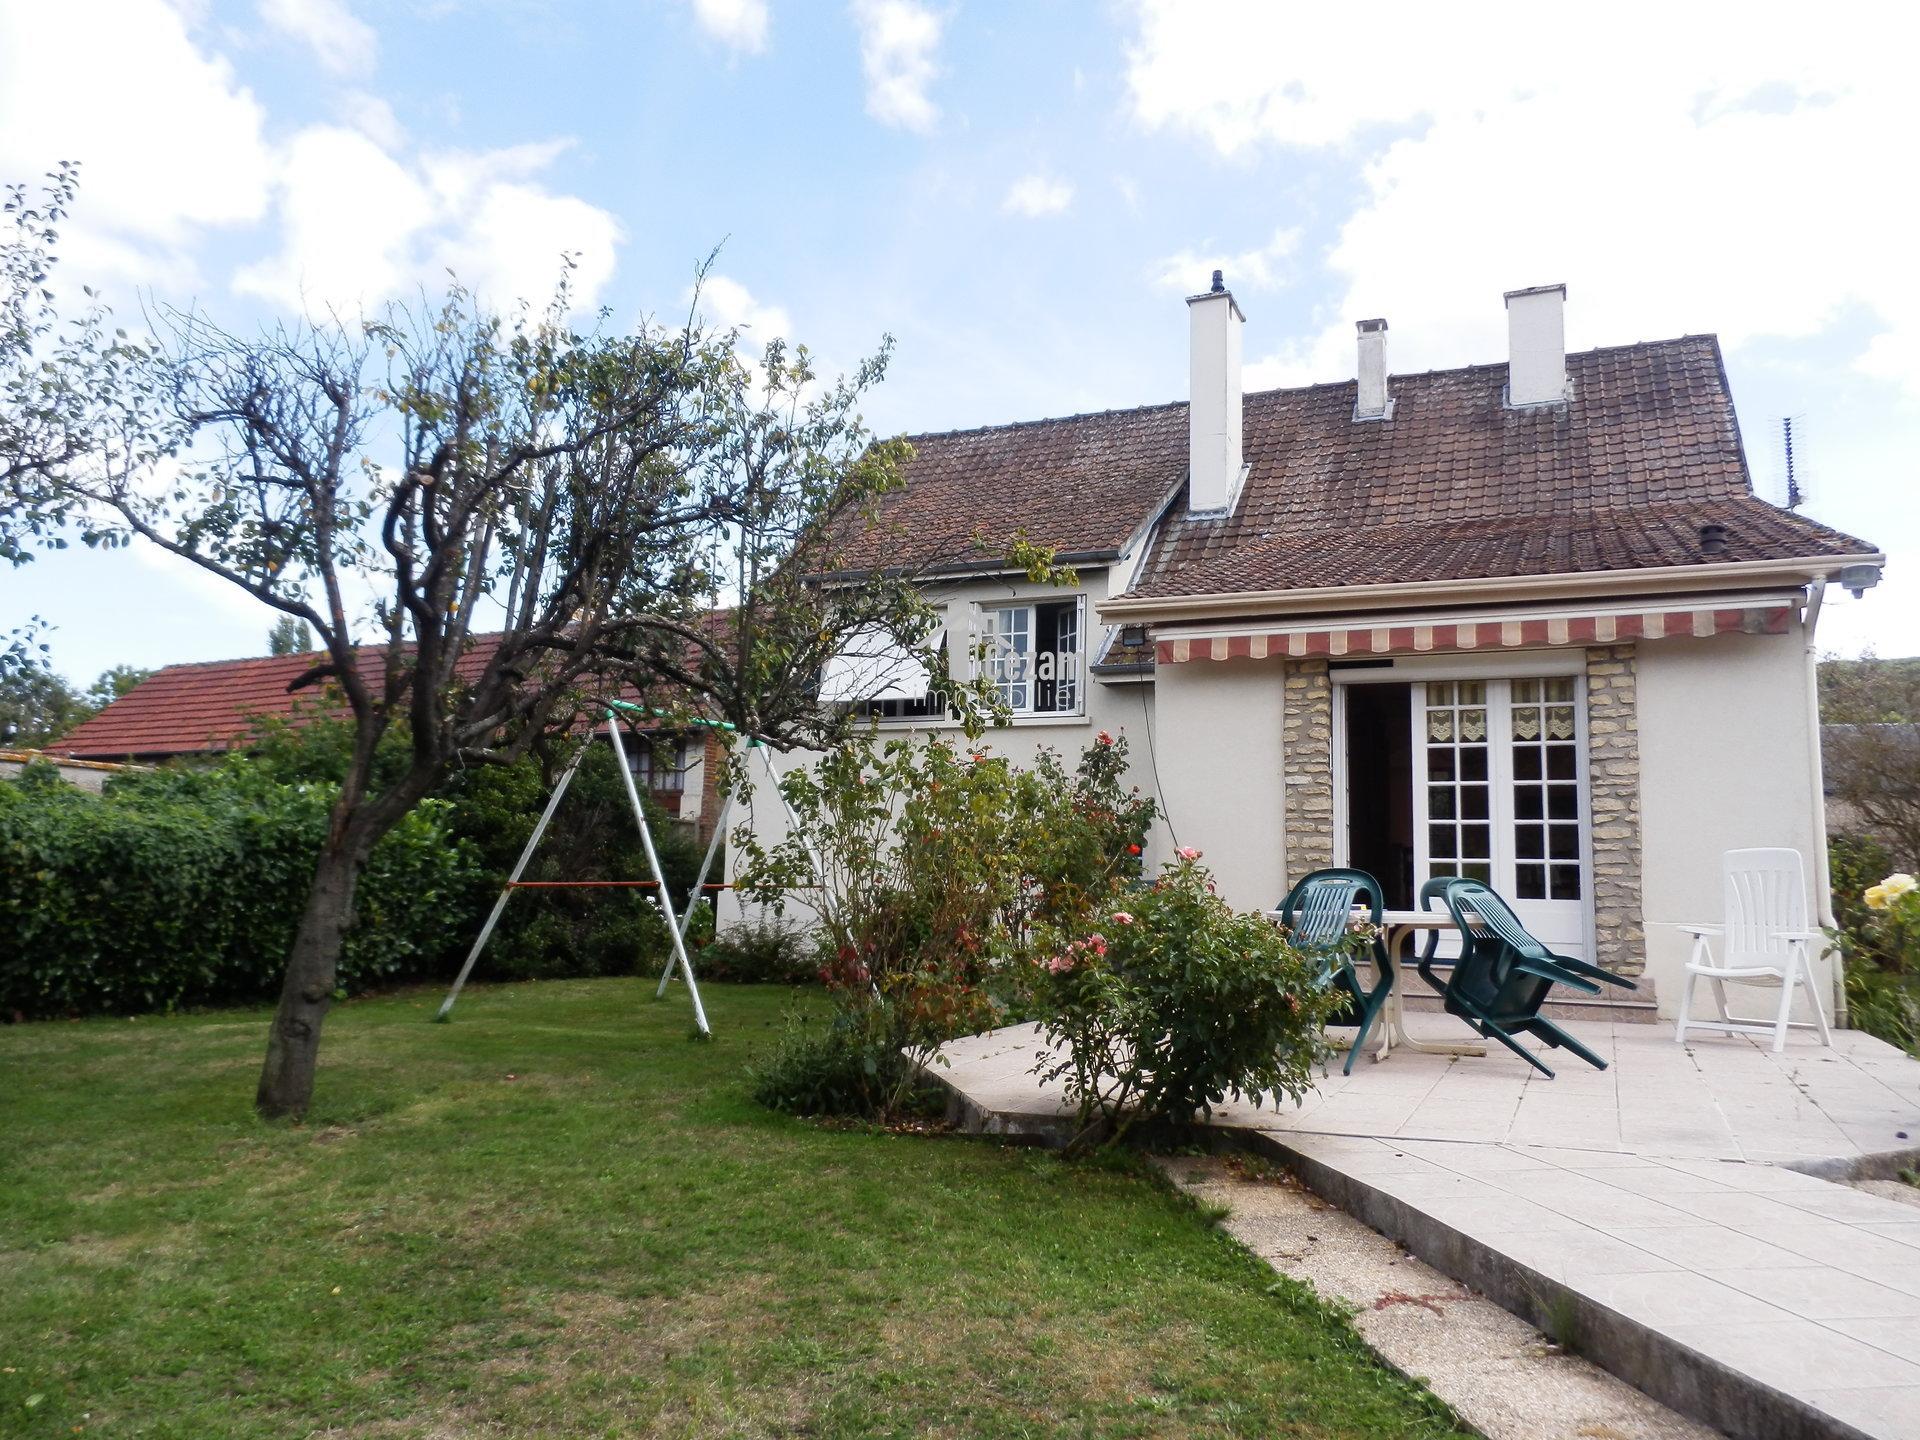 VALLEE D'ITON - Maison lumineuse et atypique